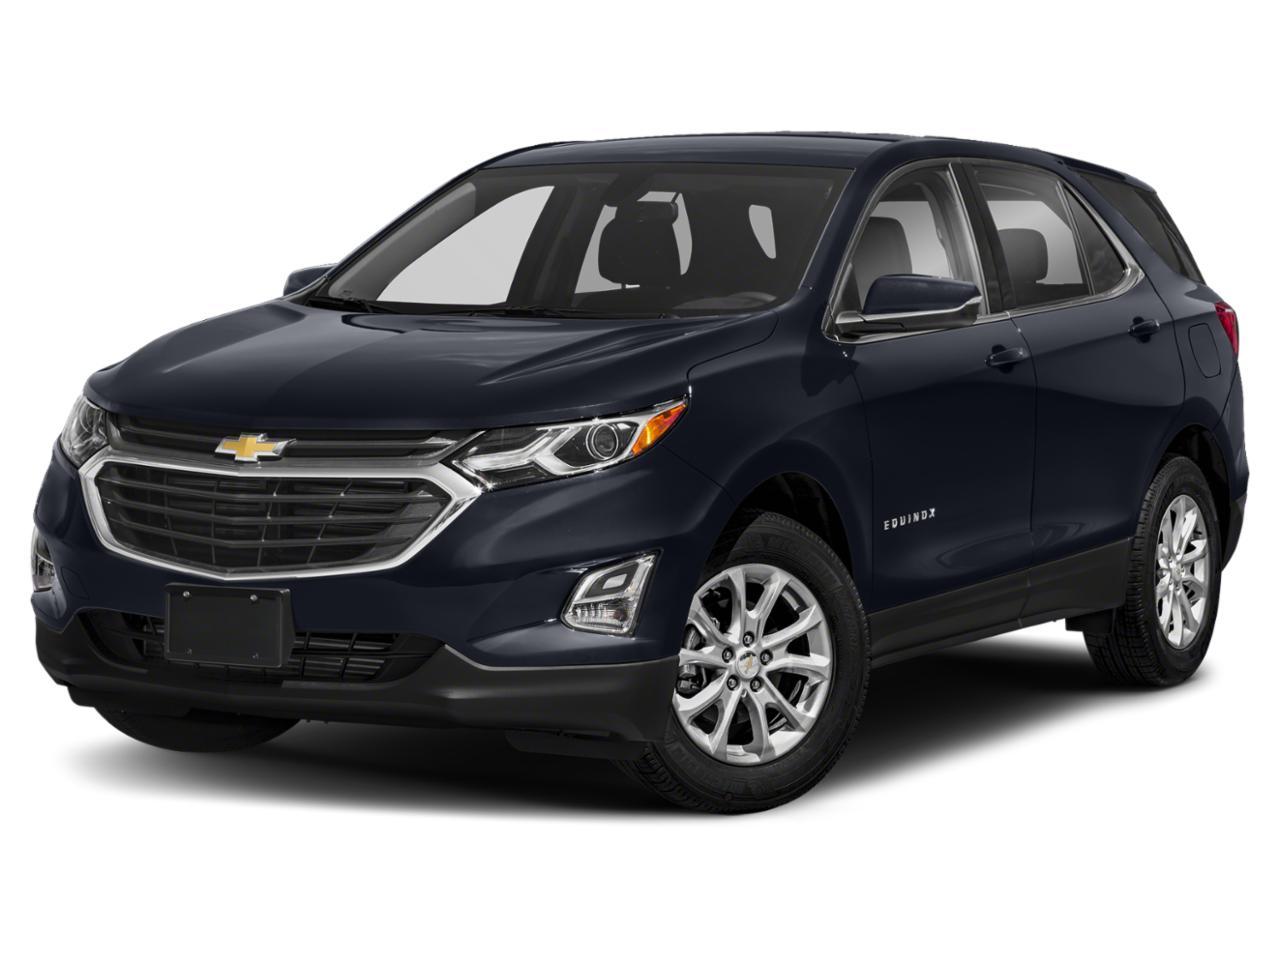 2020 Chevrolet Equinox Vehicle Photo in GARDNER, MA 01440-3110